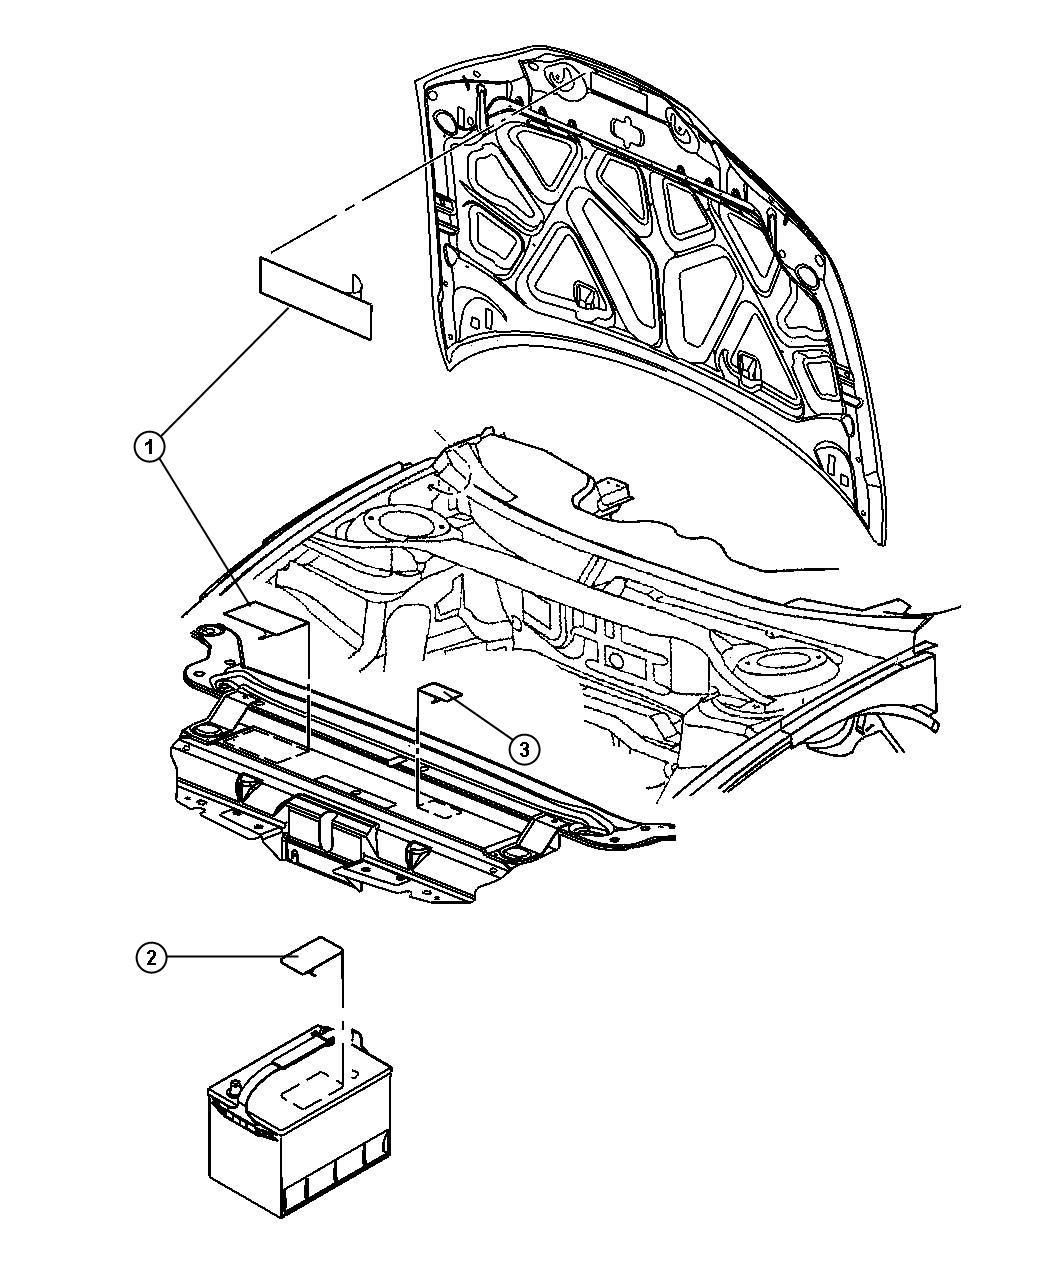 2009 Dodge Challenger R/T 5.7L HEMI VCT, 6-Speed Manual